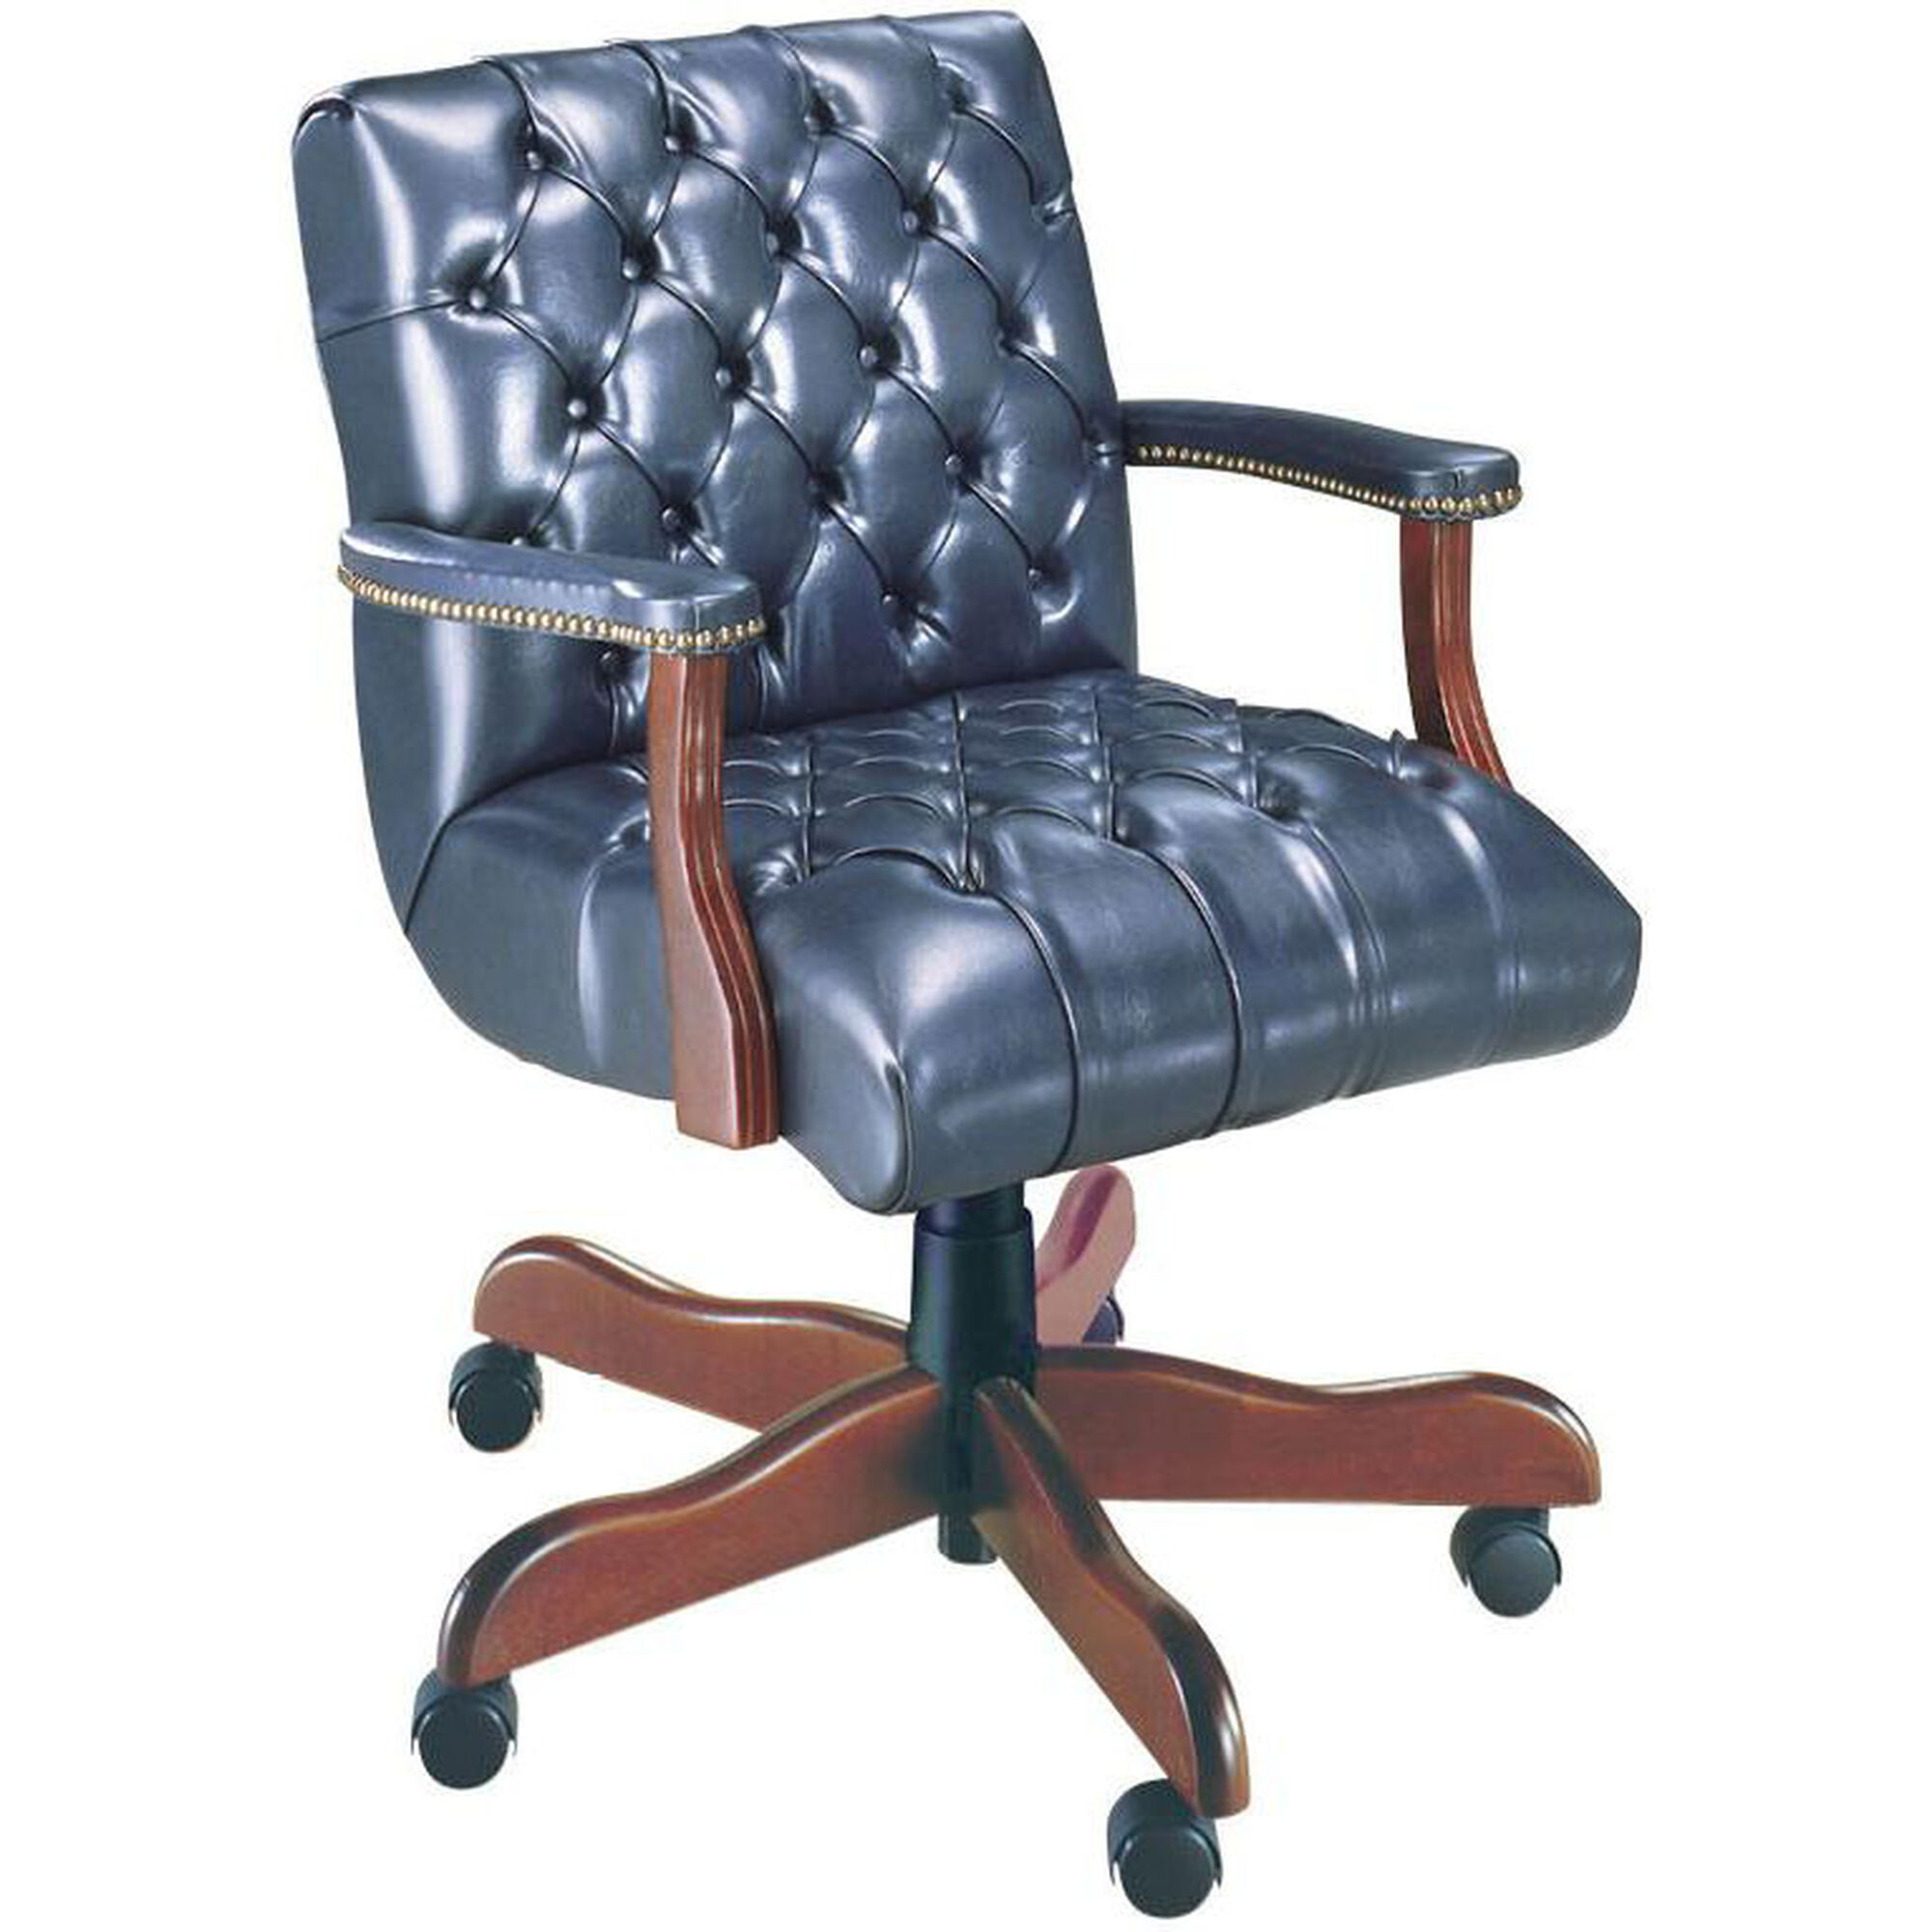 High Point Furniture Industries 4167 Hpf 4167